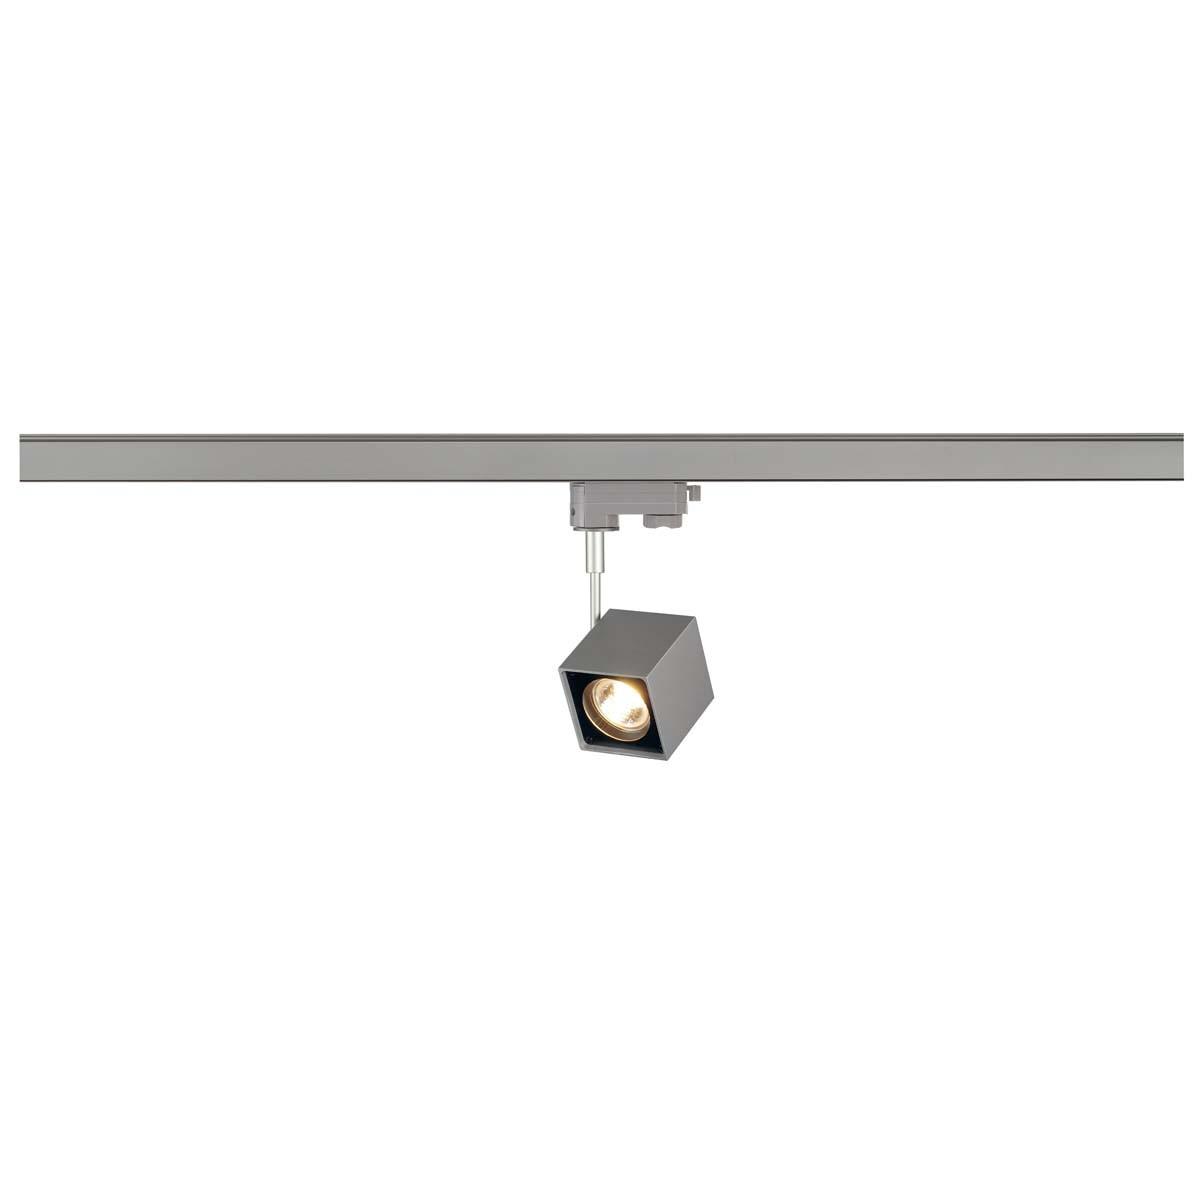 SLV 152324 Altra Dice 50W Silver Grey & Black Eutrac 3 Circuit 240V Track Light